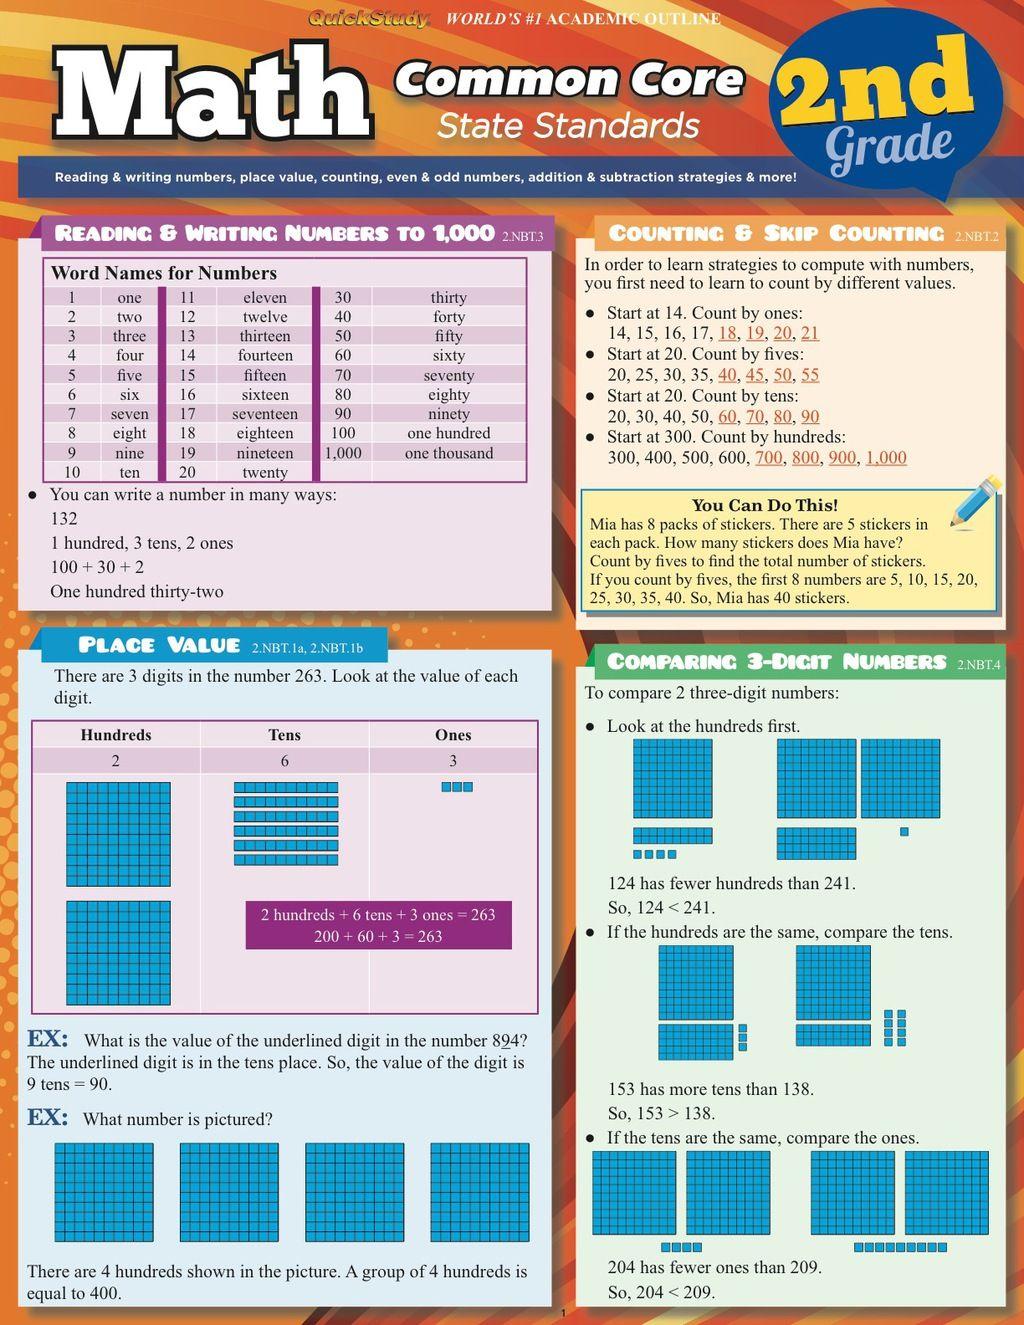 Quickstudy Math Common Core 2nd Grade Ebook Rental